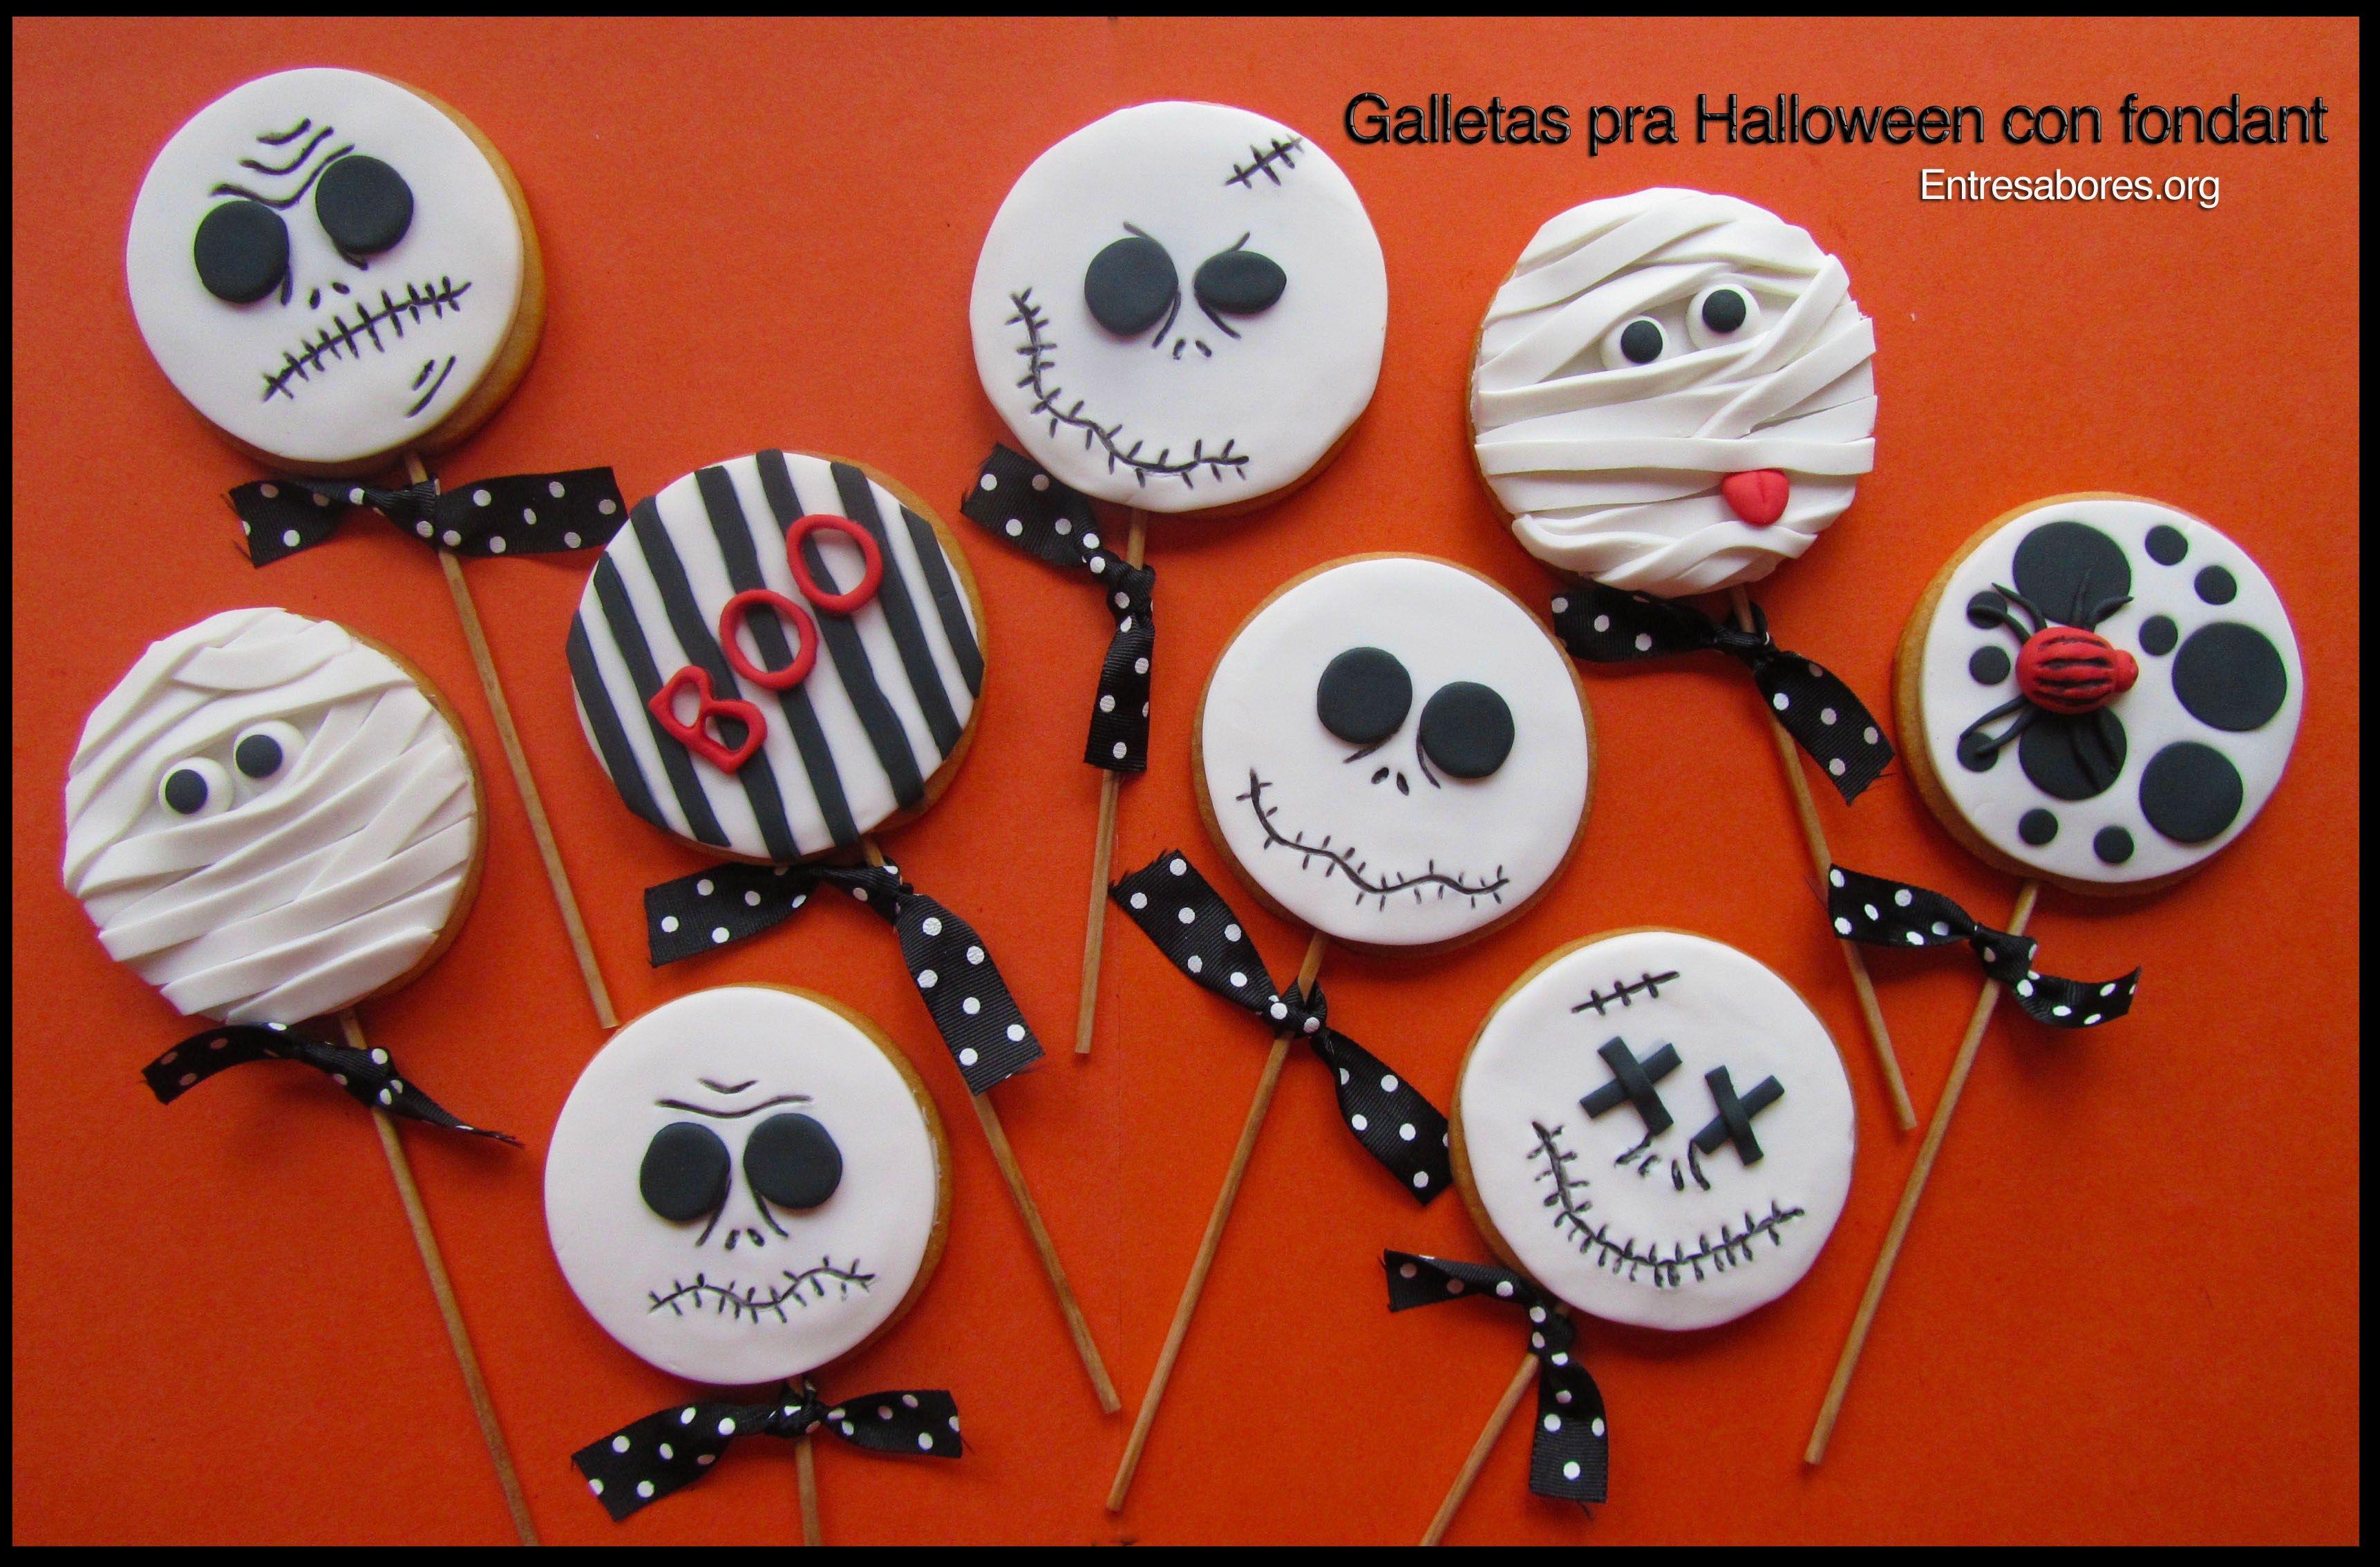 Galletas para Halloween con fondant Halloween galletas Pinterest